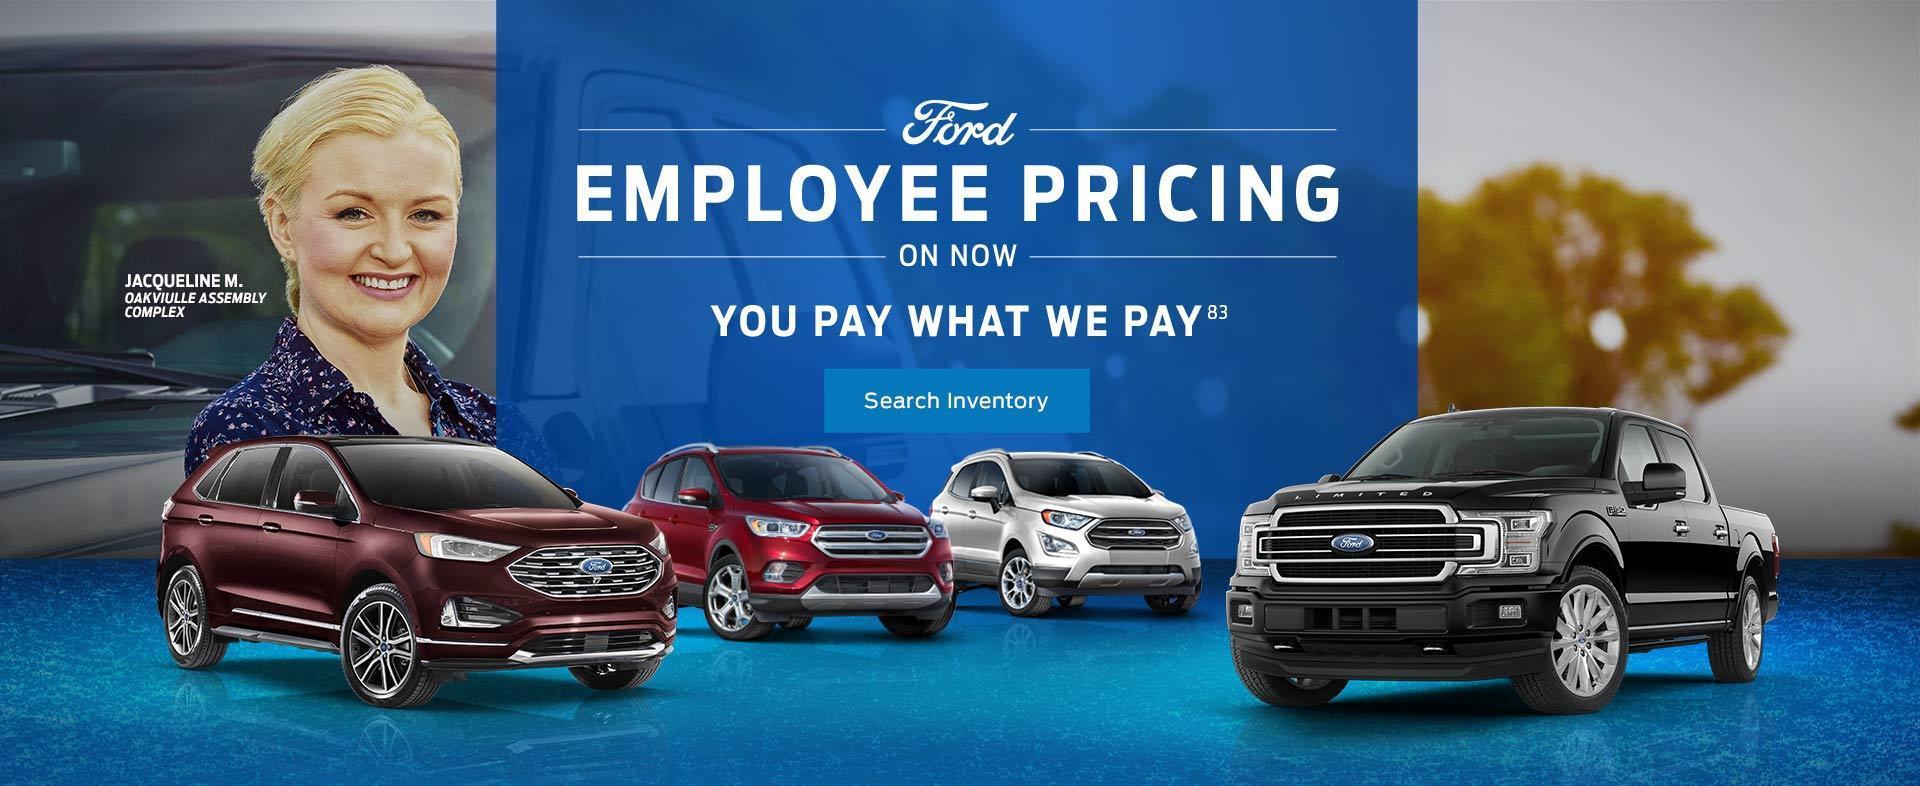 Rose City Ford Windsor / New & Used Car Ford Dealership